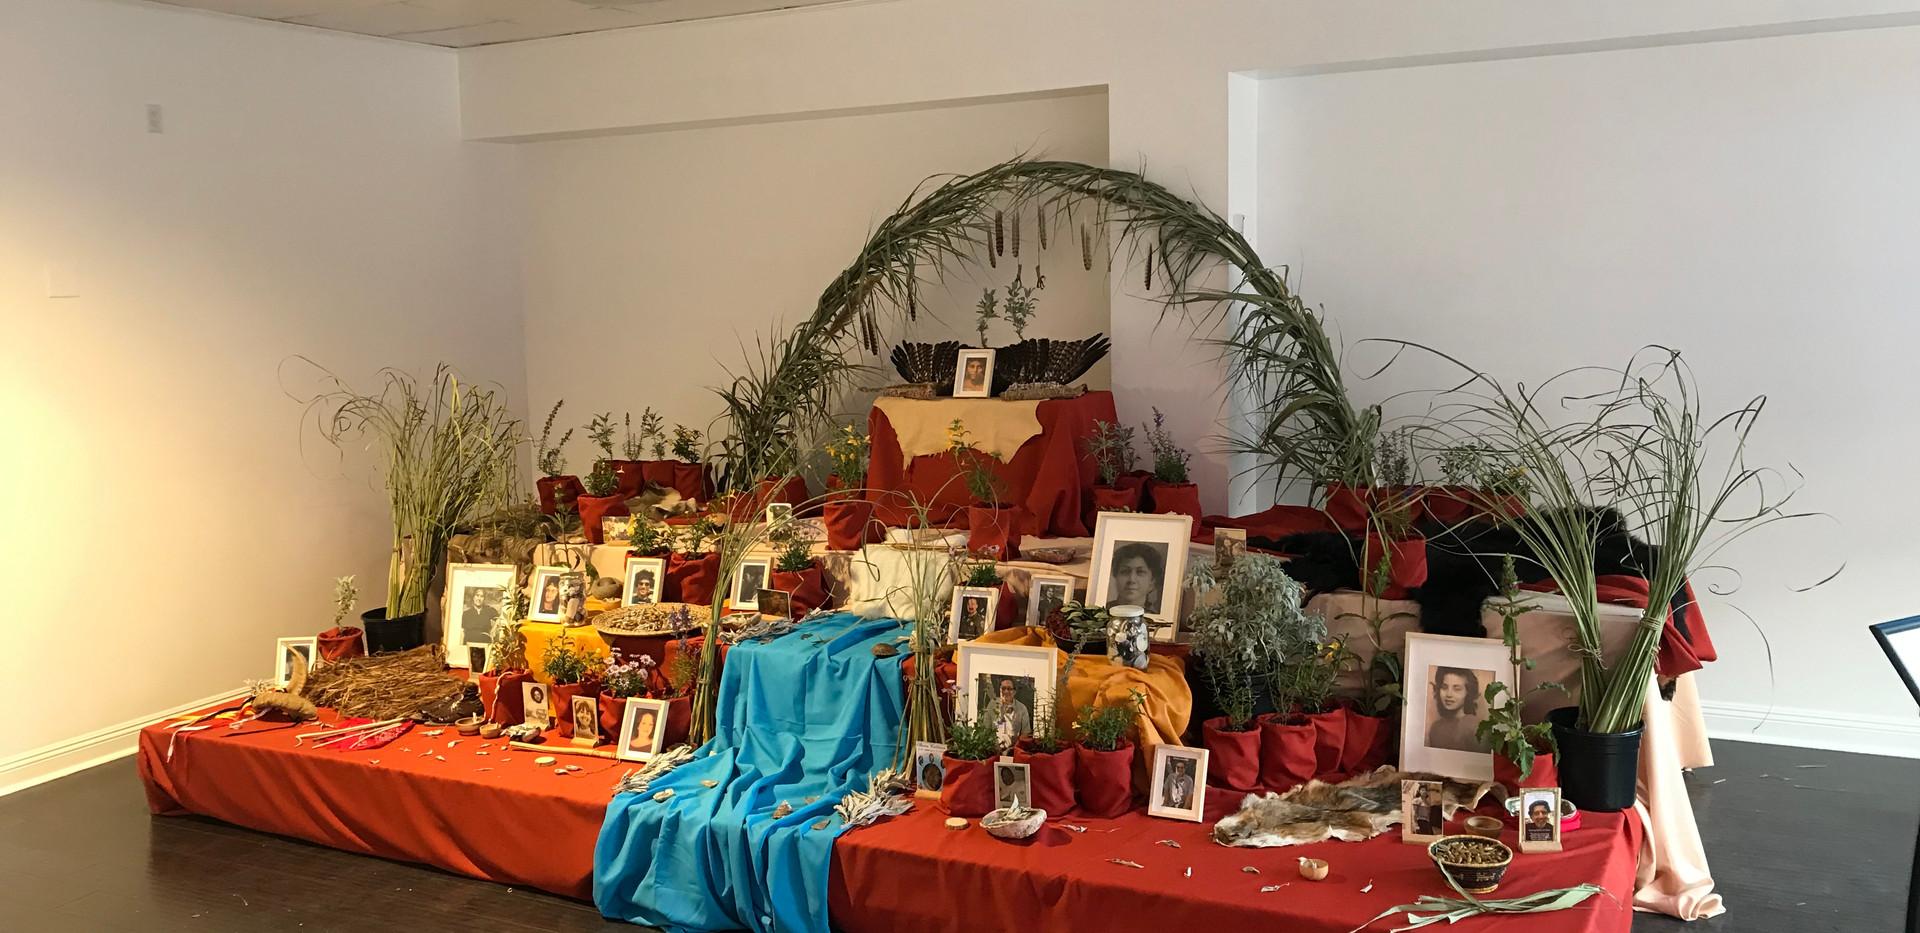 Yaanga Vive! Altar at Dia de los Muertos Celebration